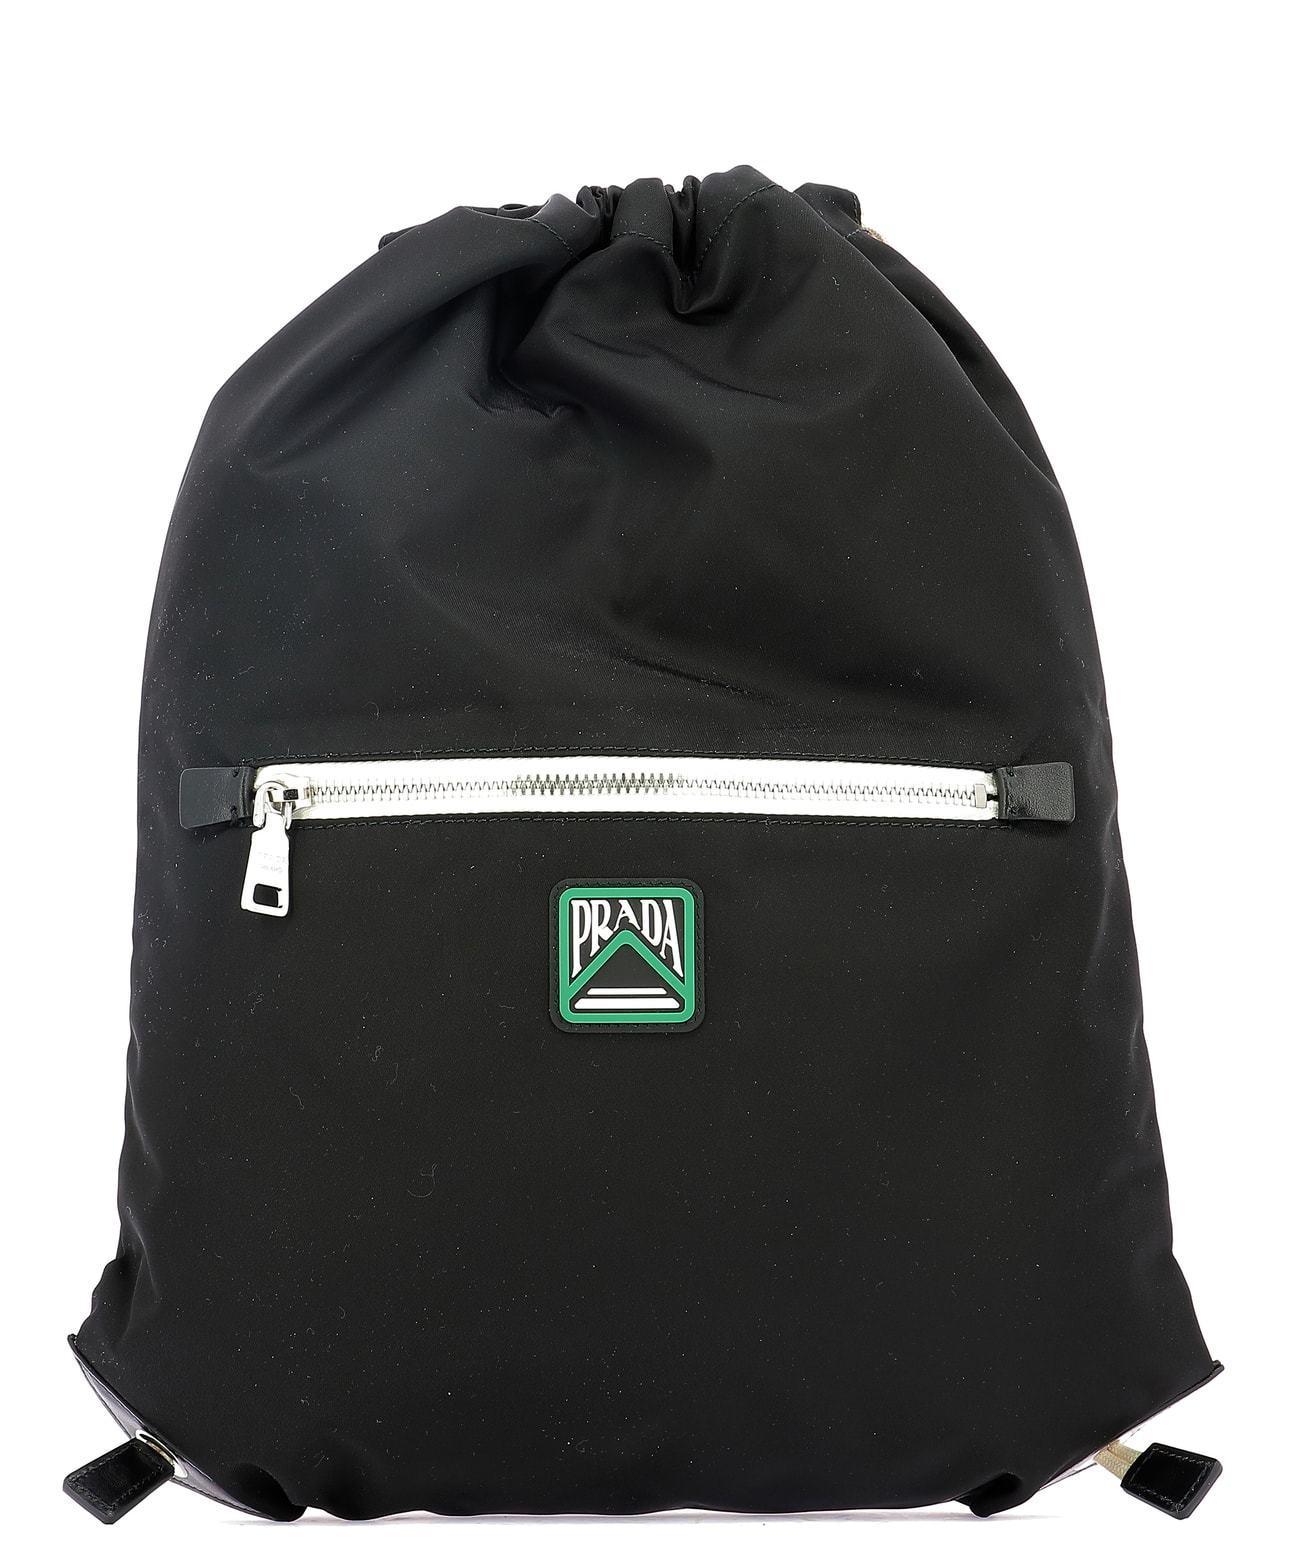 13a3ac6d9897 Lyst - Prada Baltico Logo Backpack in Black for Men